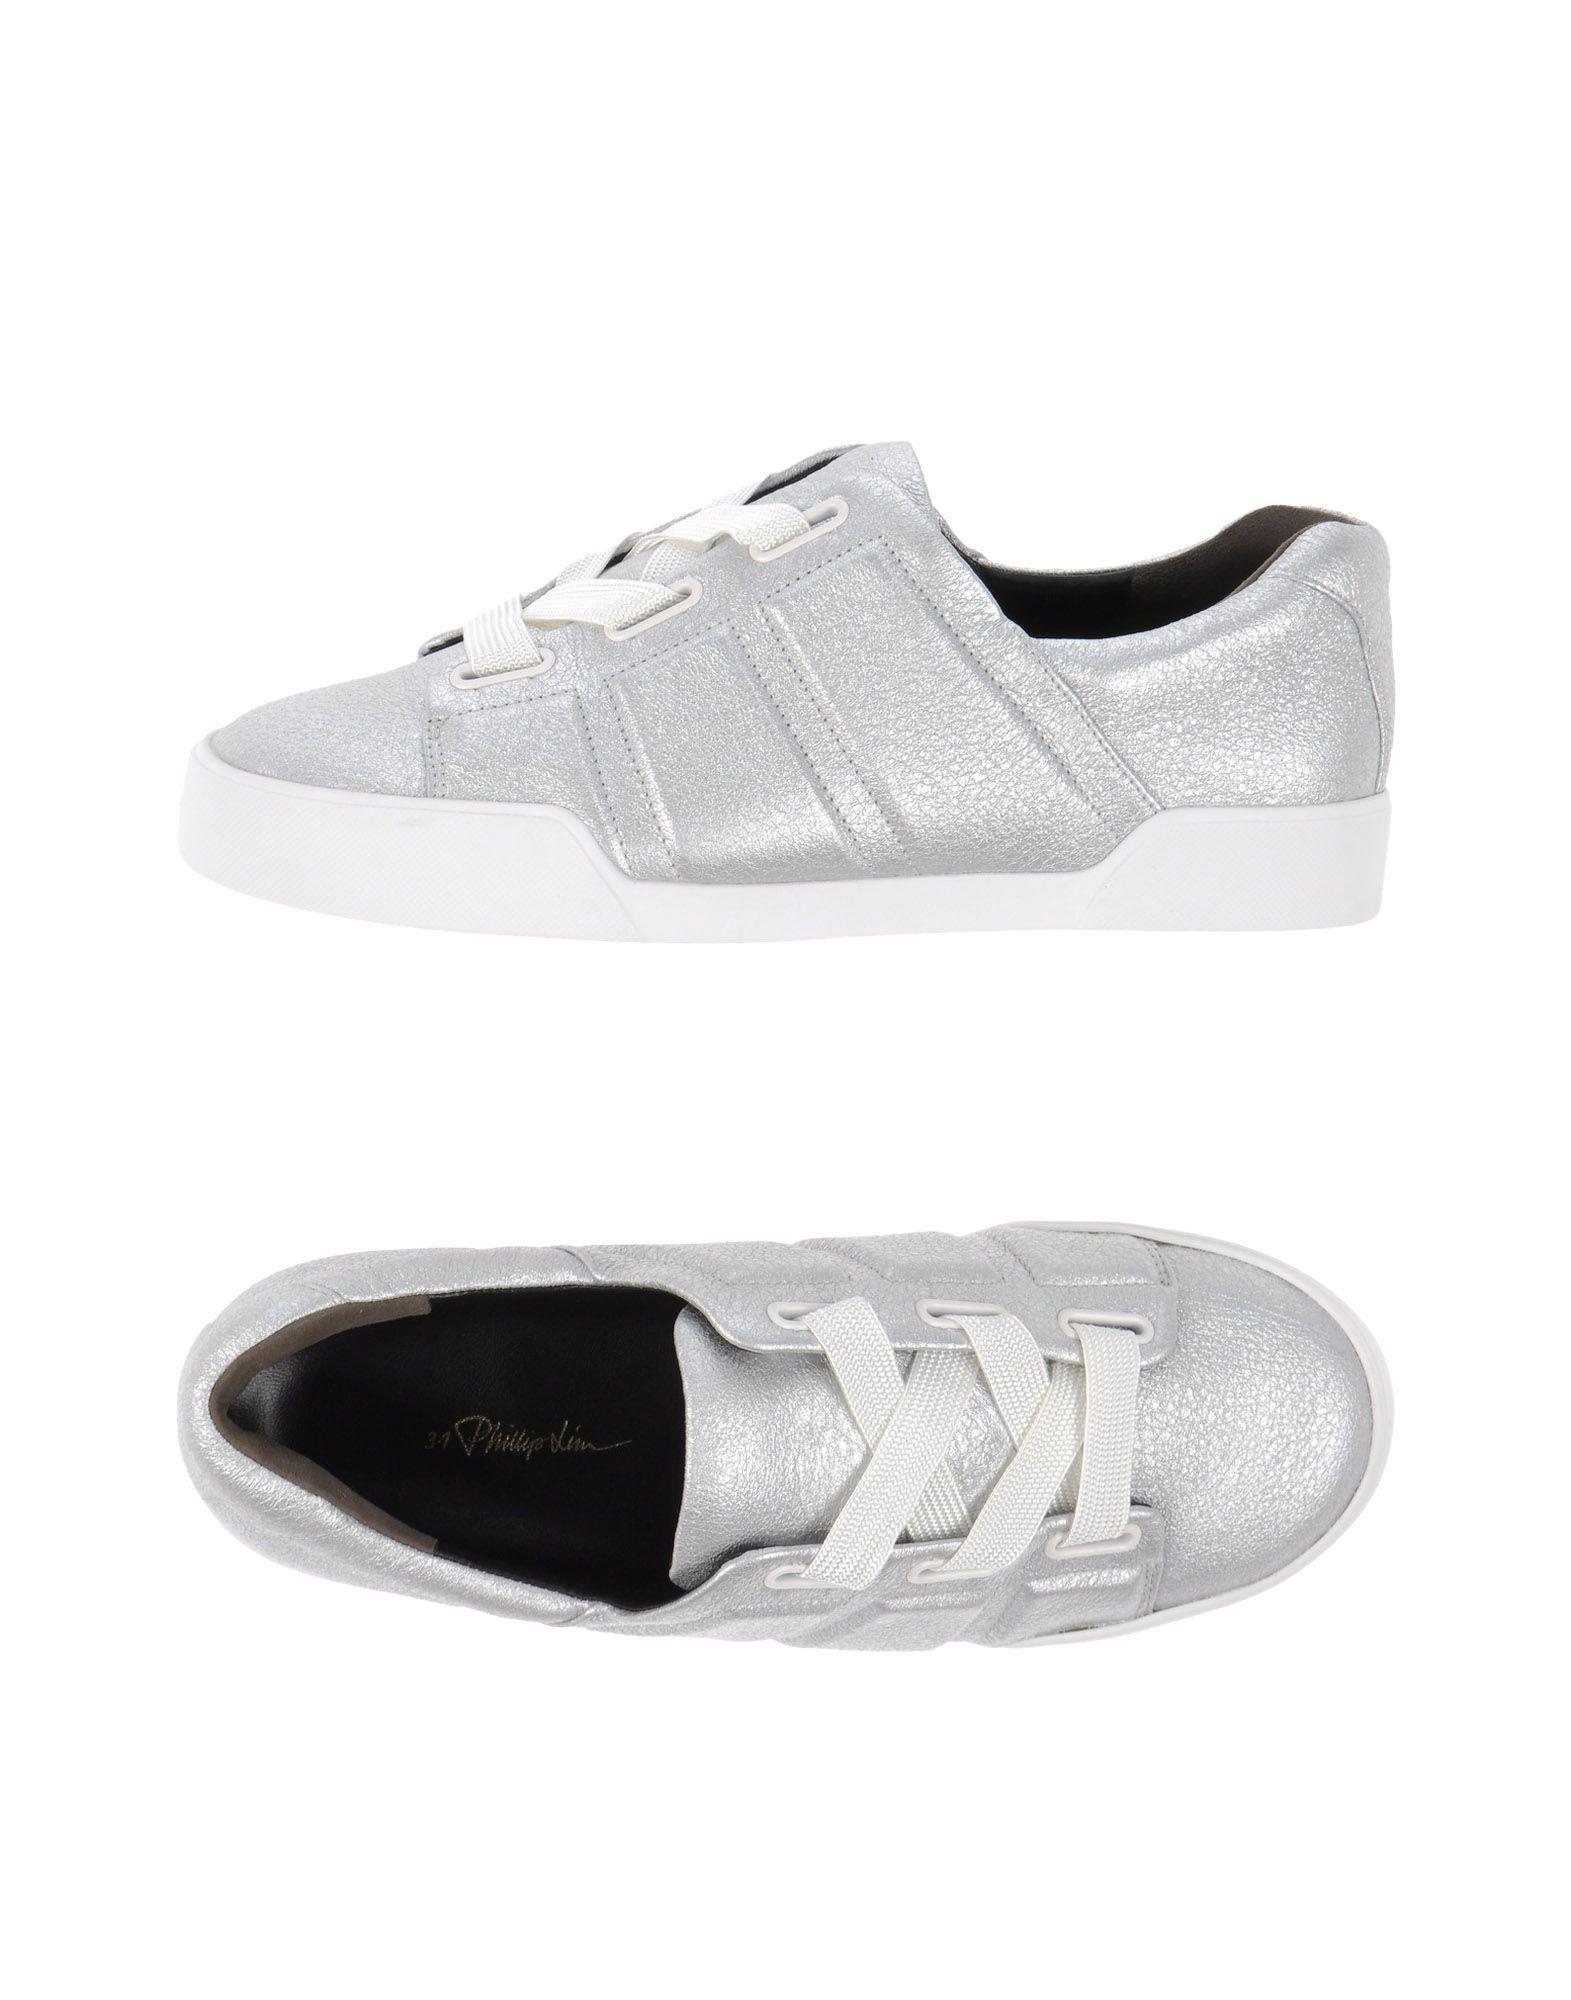 FOOTWEAR - Low-tops & sneakers on YOOX.COM 3.1 Phillip Lim s5ERlrBEzf